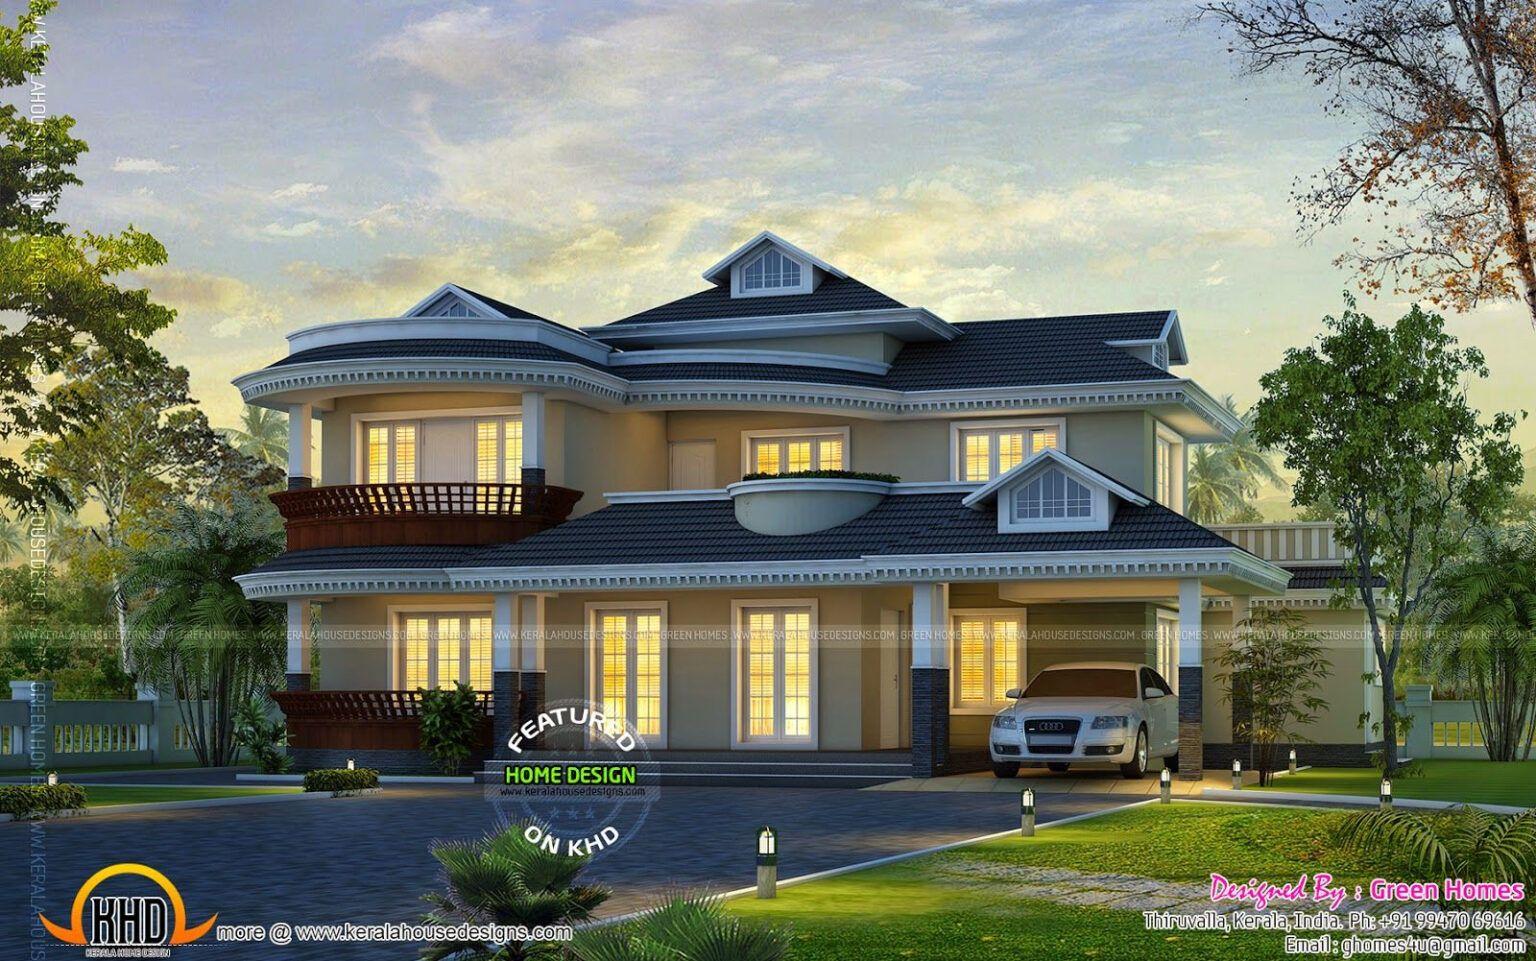 2400 Sq Ft House Plans 3d House Plans Ide Bagus In 2020 Kerala House Design Kerala Houses Dream Home Design